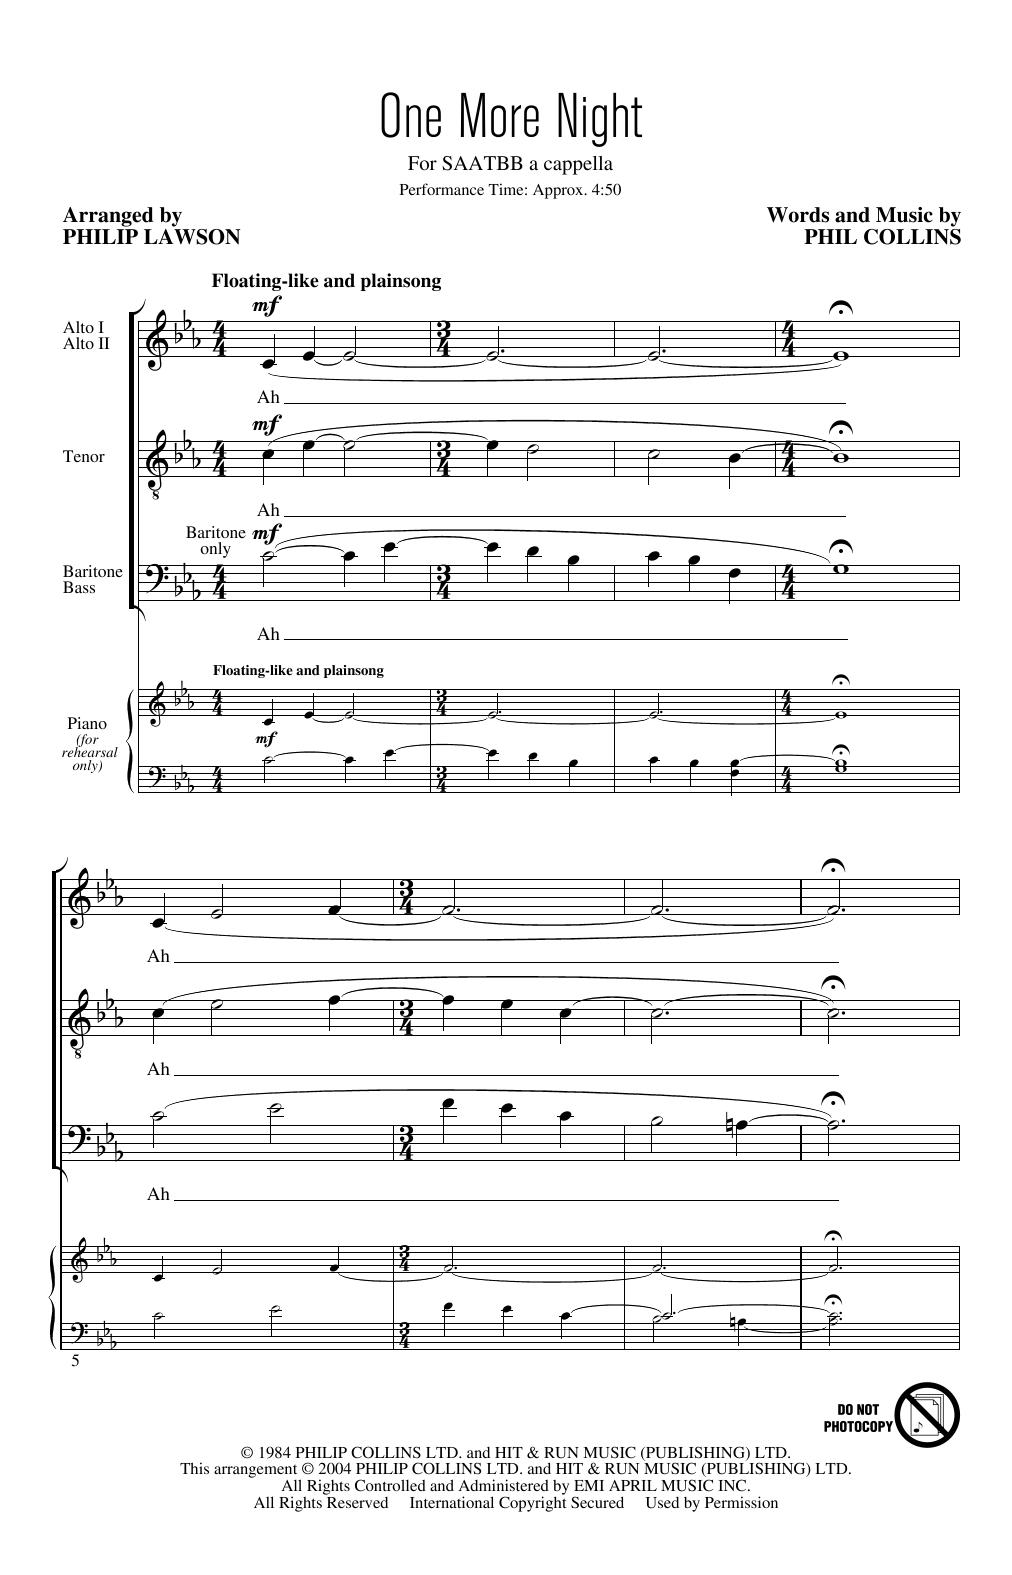 One More Night (arr. Philip Lawson) (SATB Choir)